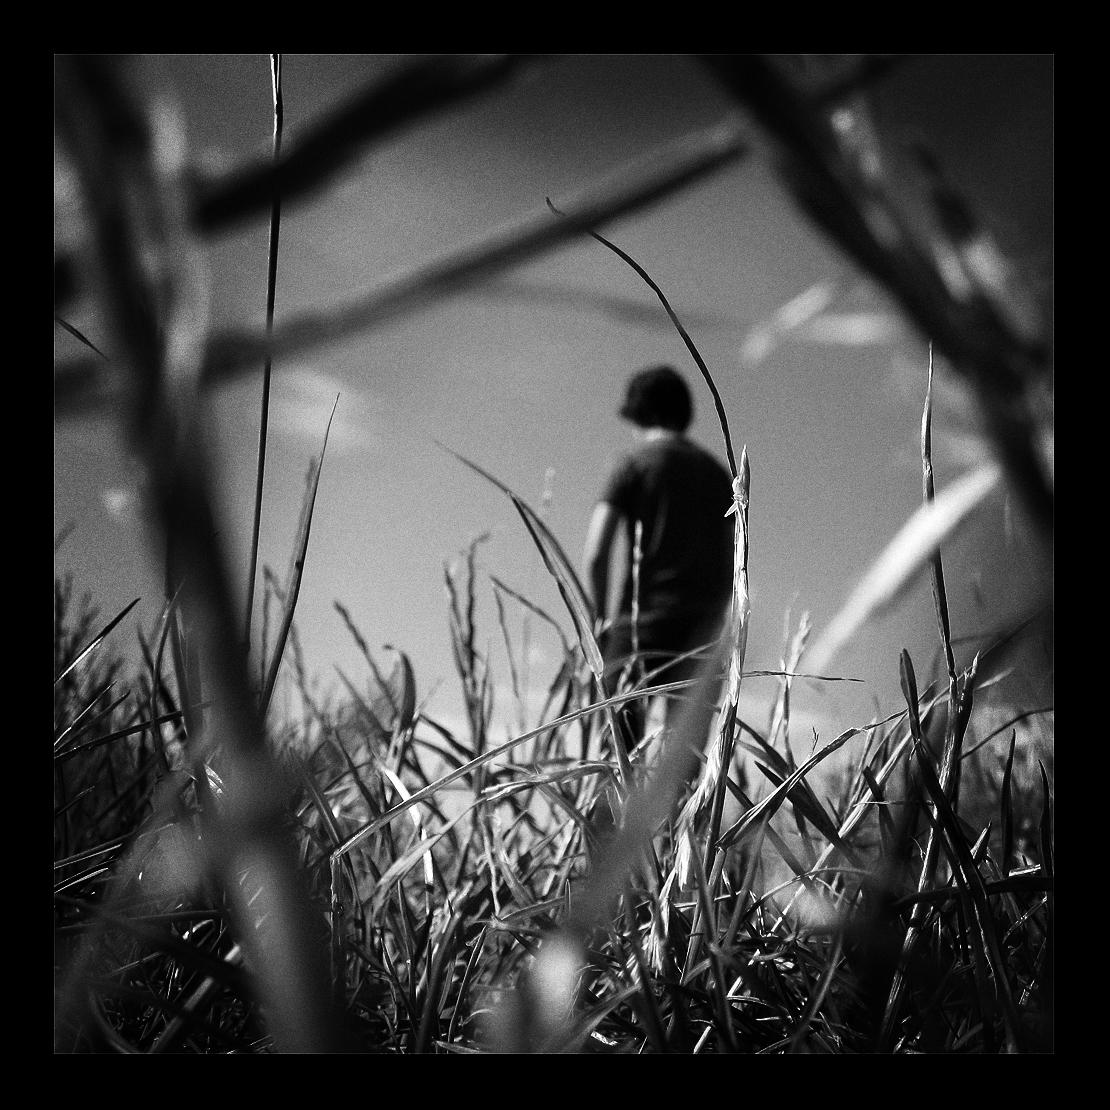 Lonely boy by milkandblue lonely boy by milkandblue